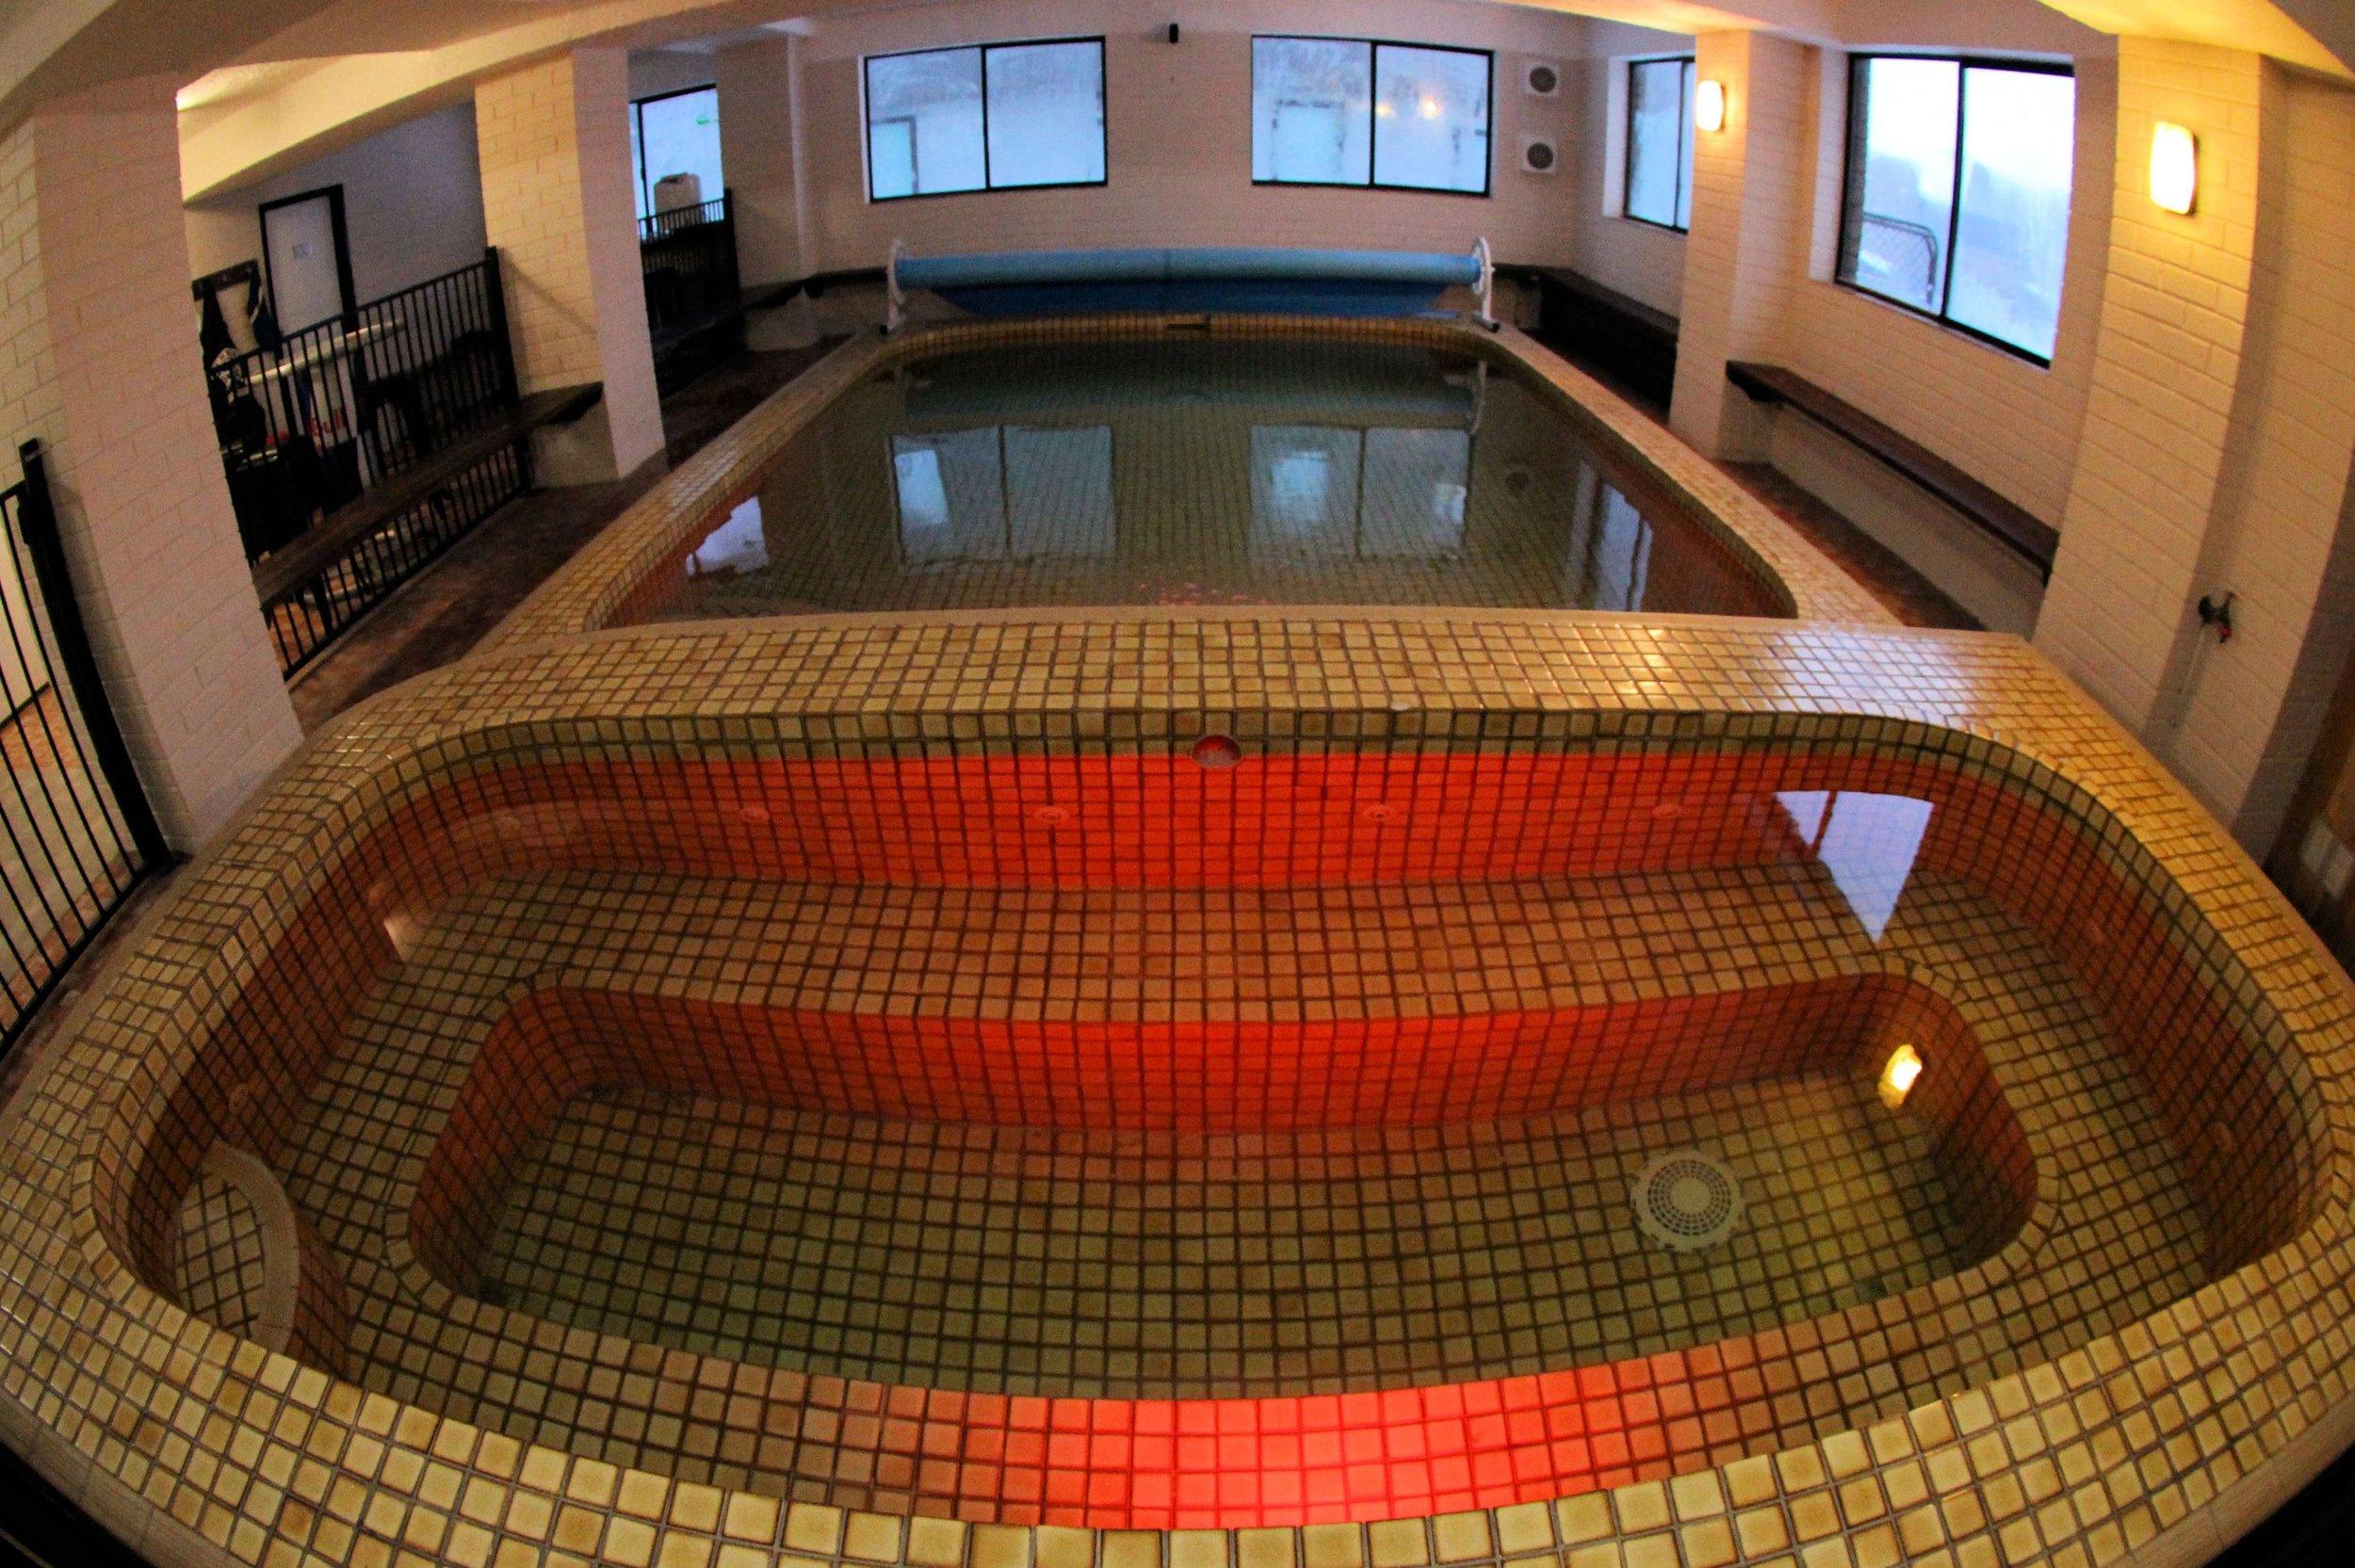 Pool and spa1.jpg